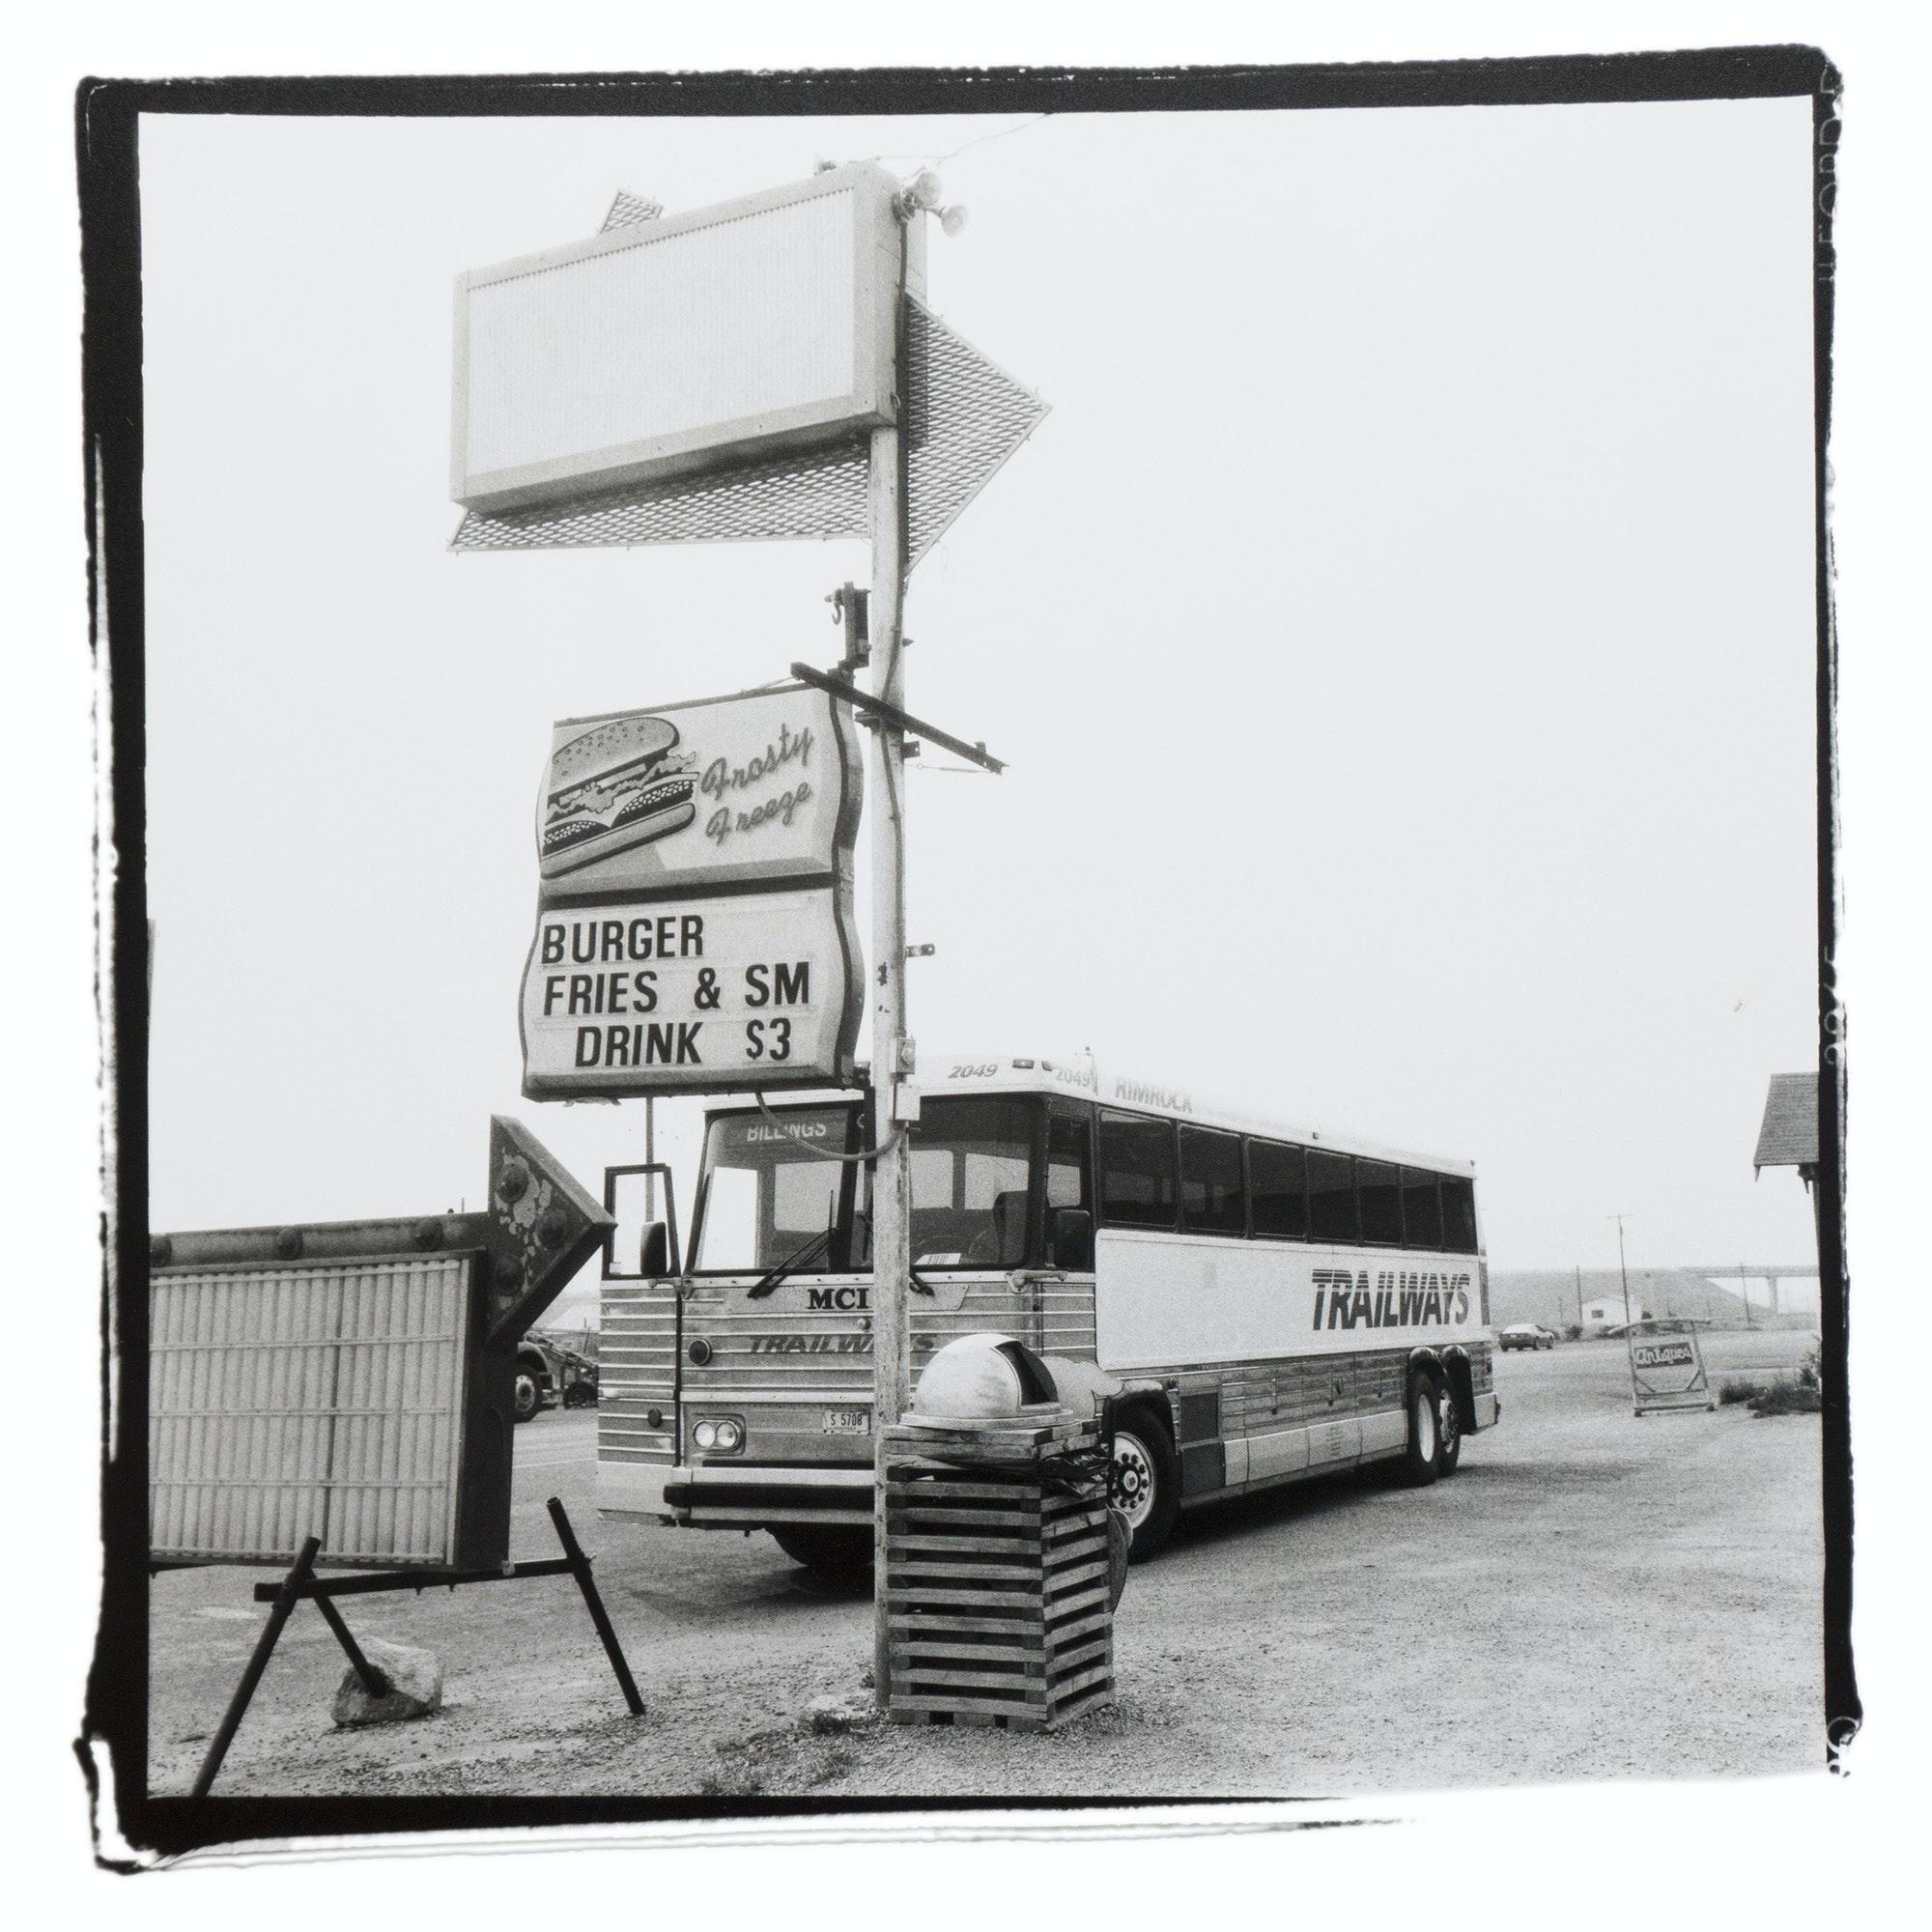 Michael Loos - Rollei5021